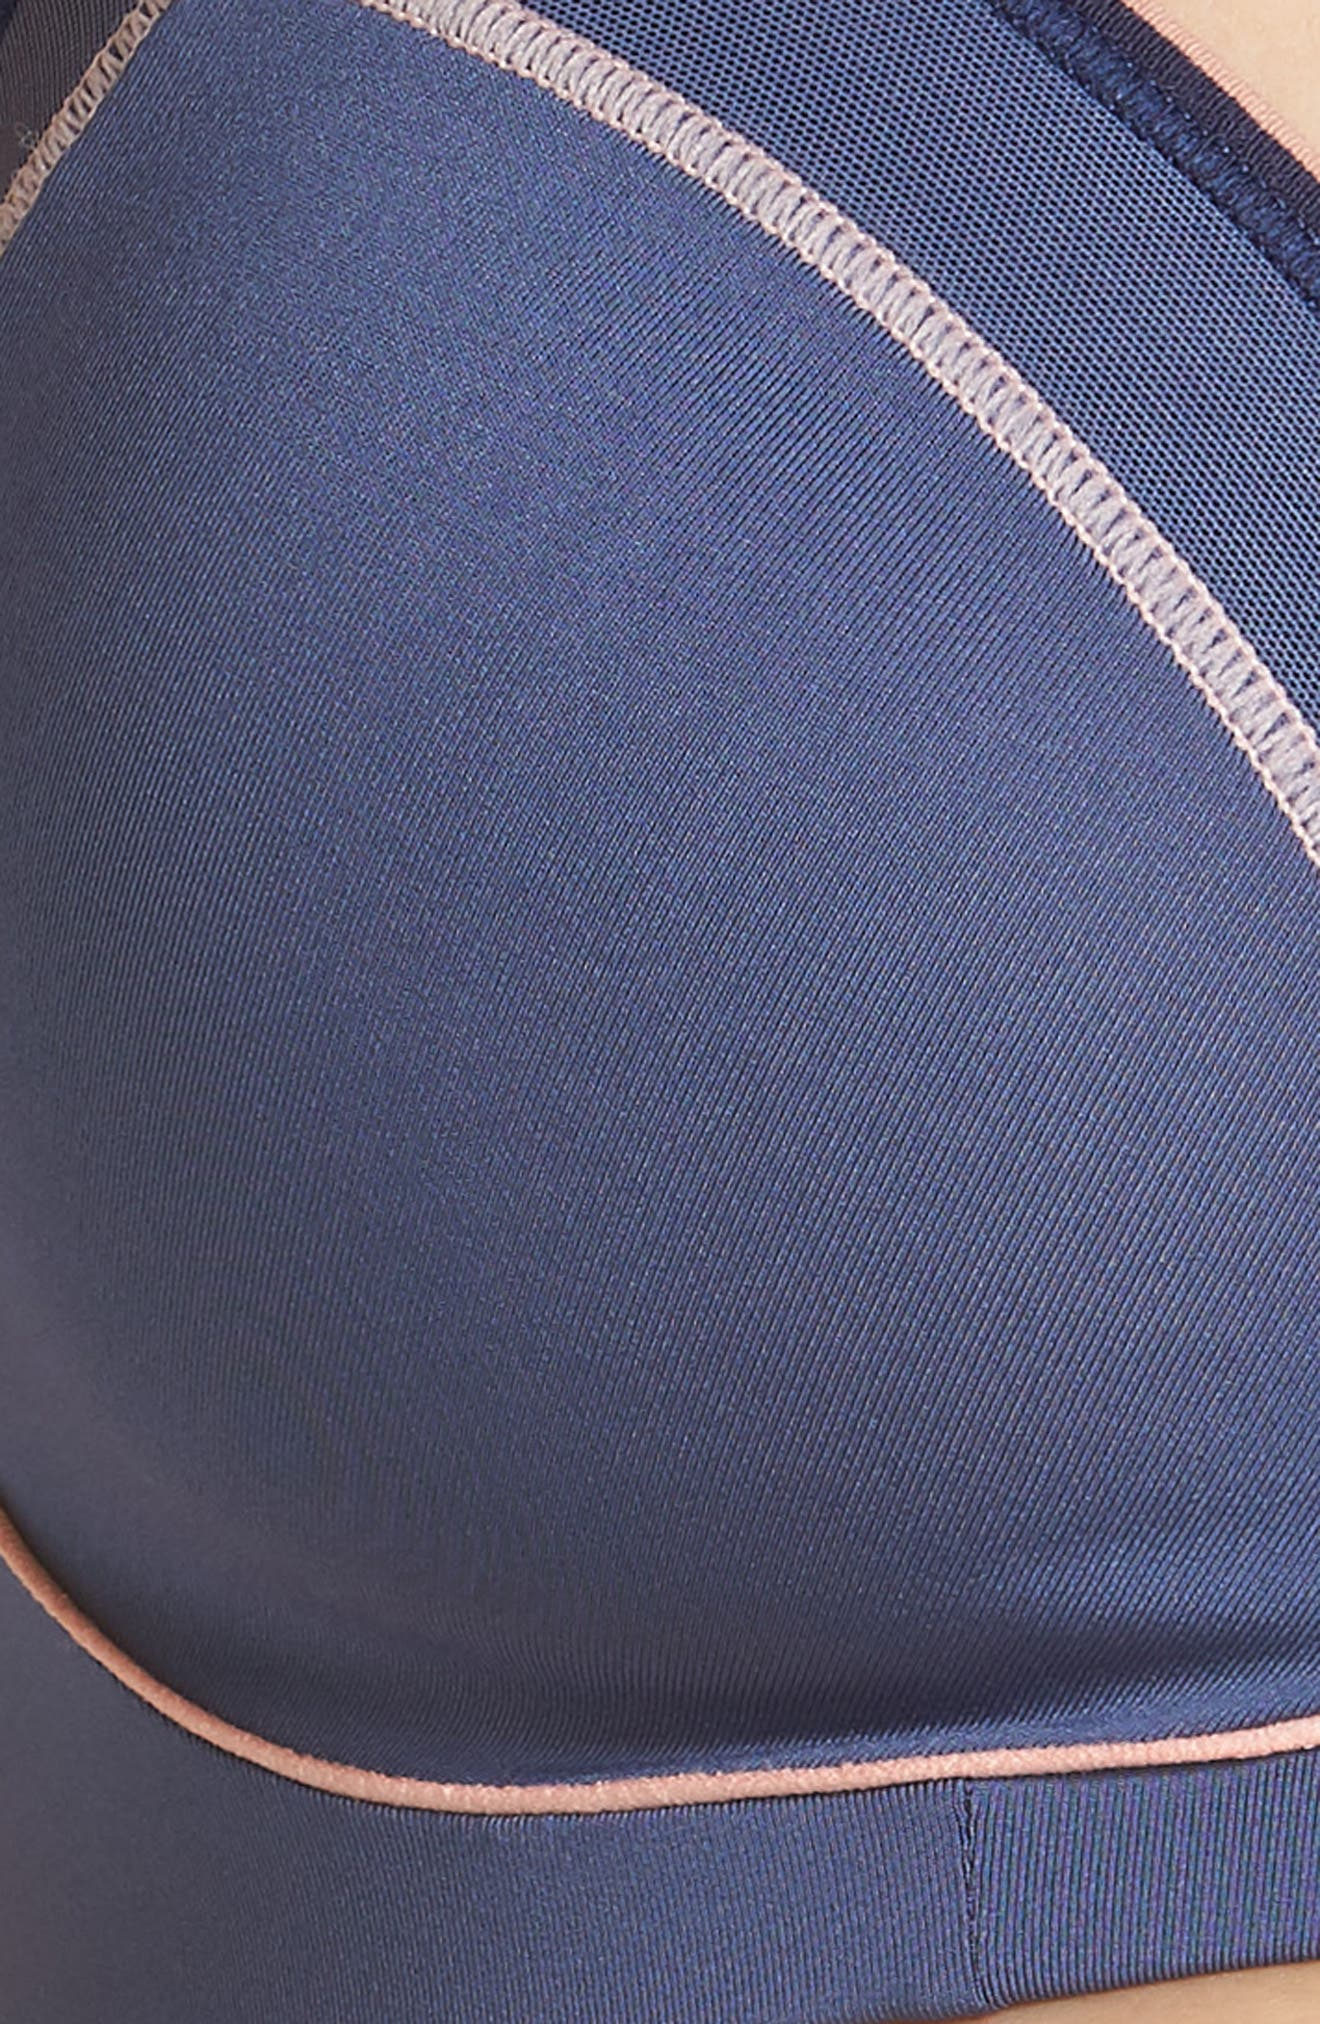 Zen Convertible Underwire Sports Bra,                             Alternate thumbnail 7, color,                             Blue Indigo/ Pale Peach